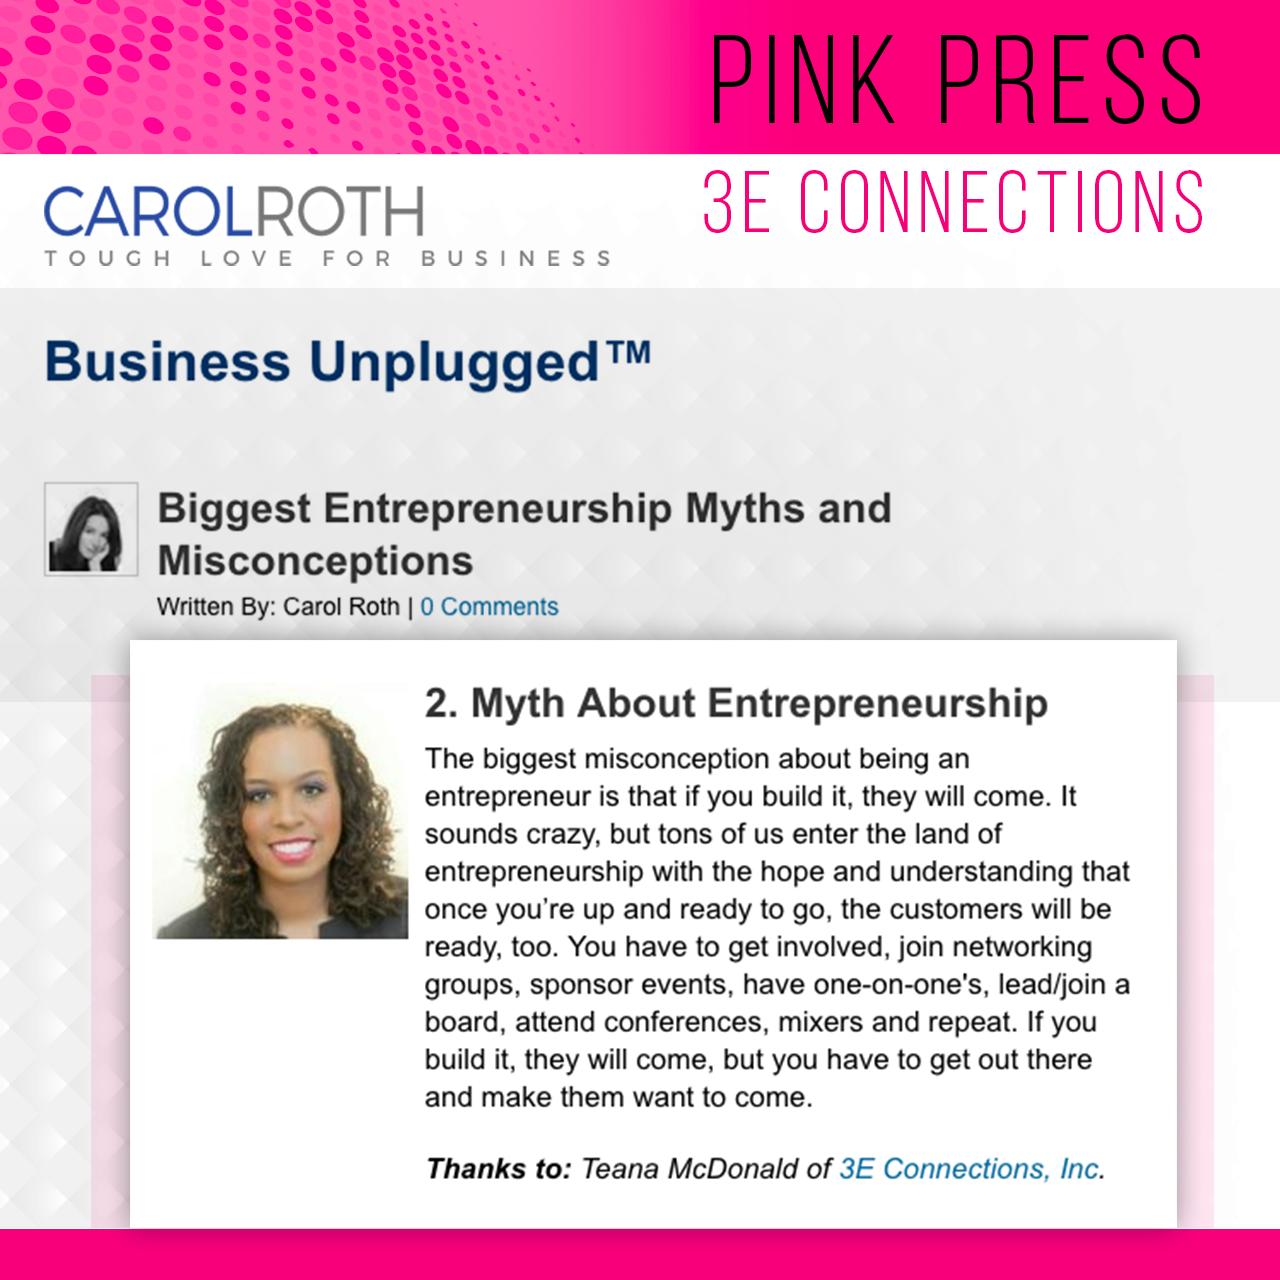 PinkPress_CarolRoth.png